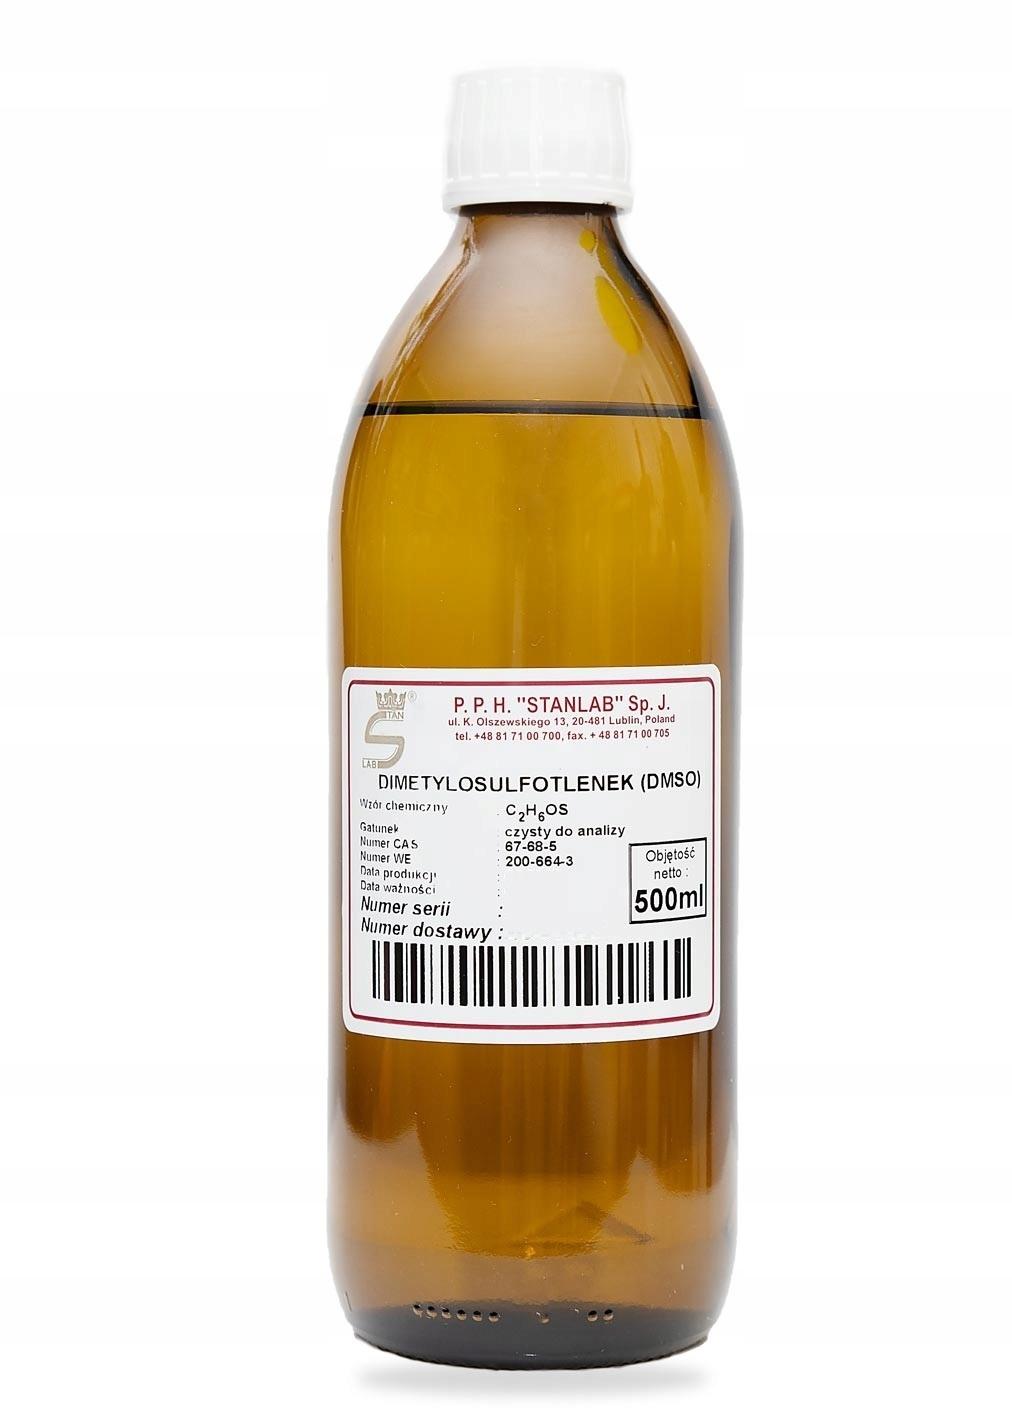 DMSO Dimetylosulfotlenek Stanlab CZDA 500ml